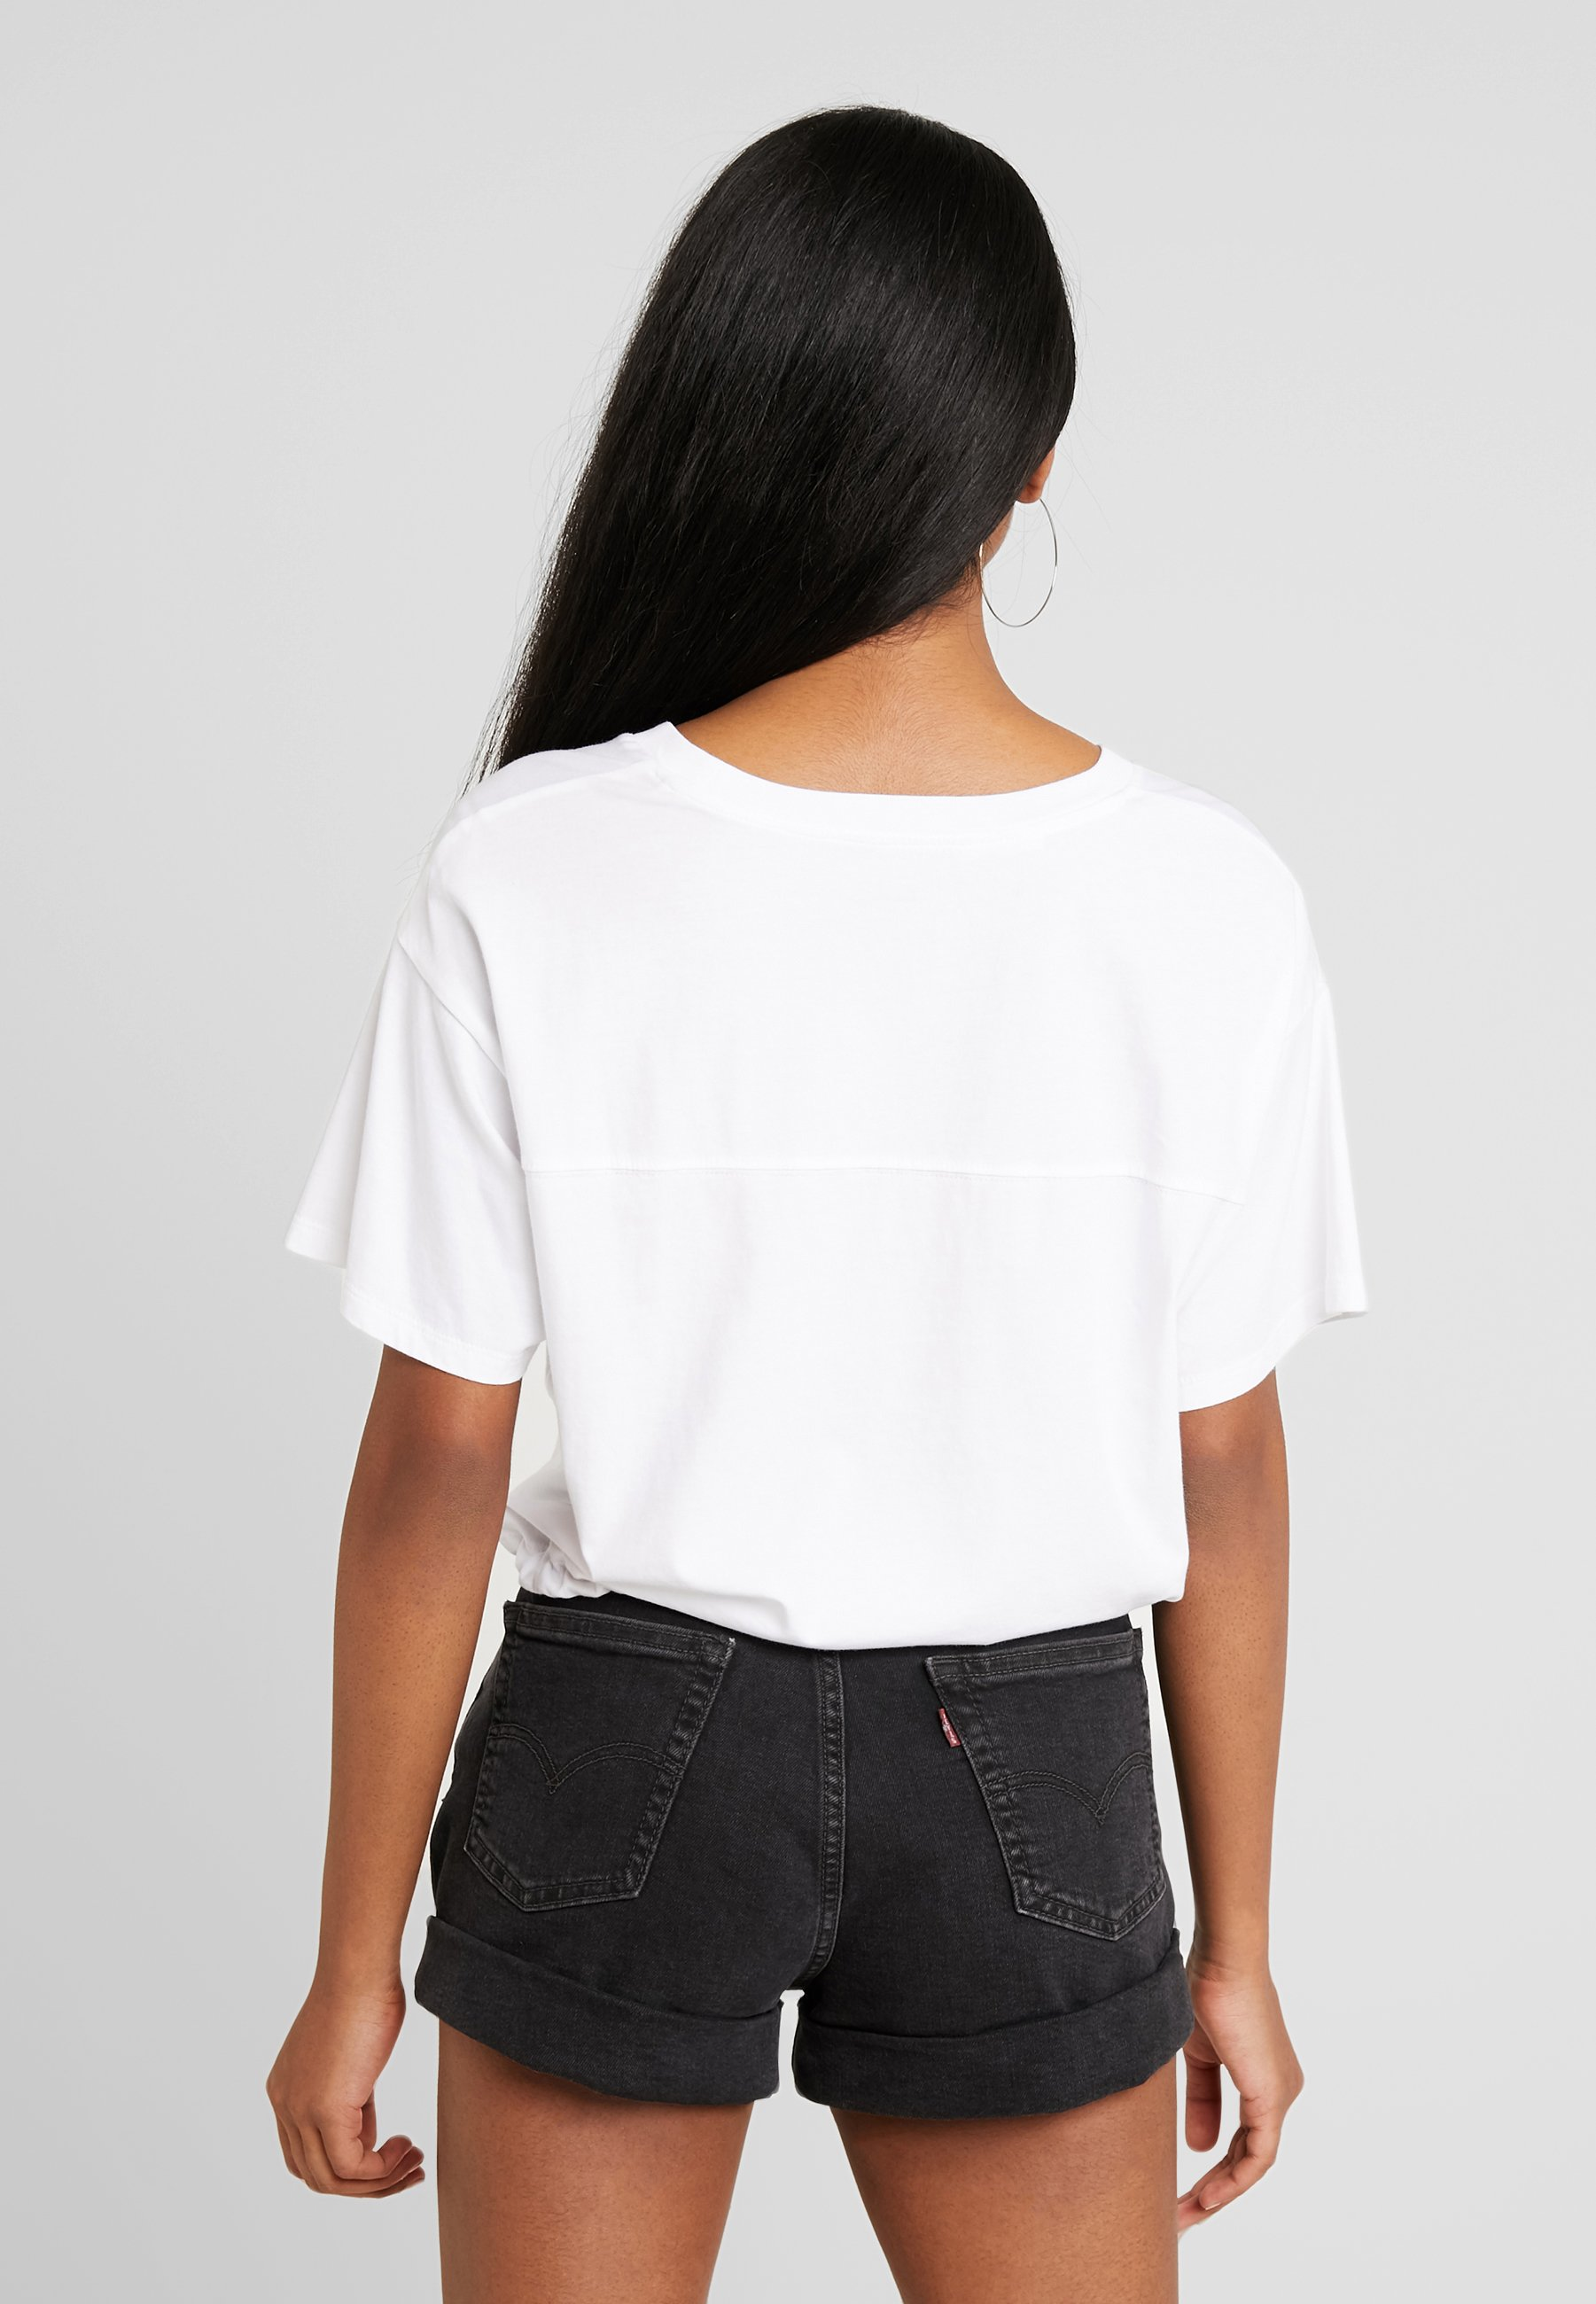 TEET imprimé Levix27;s® shirt DRAWSTRING white n0Pk8XONw